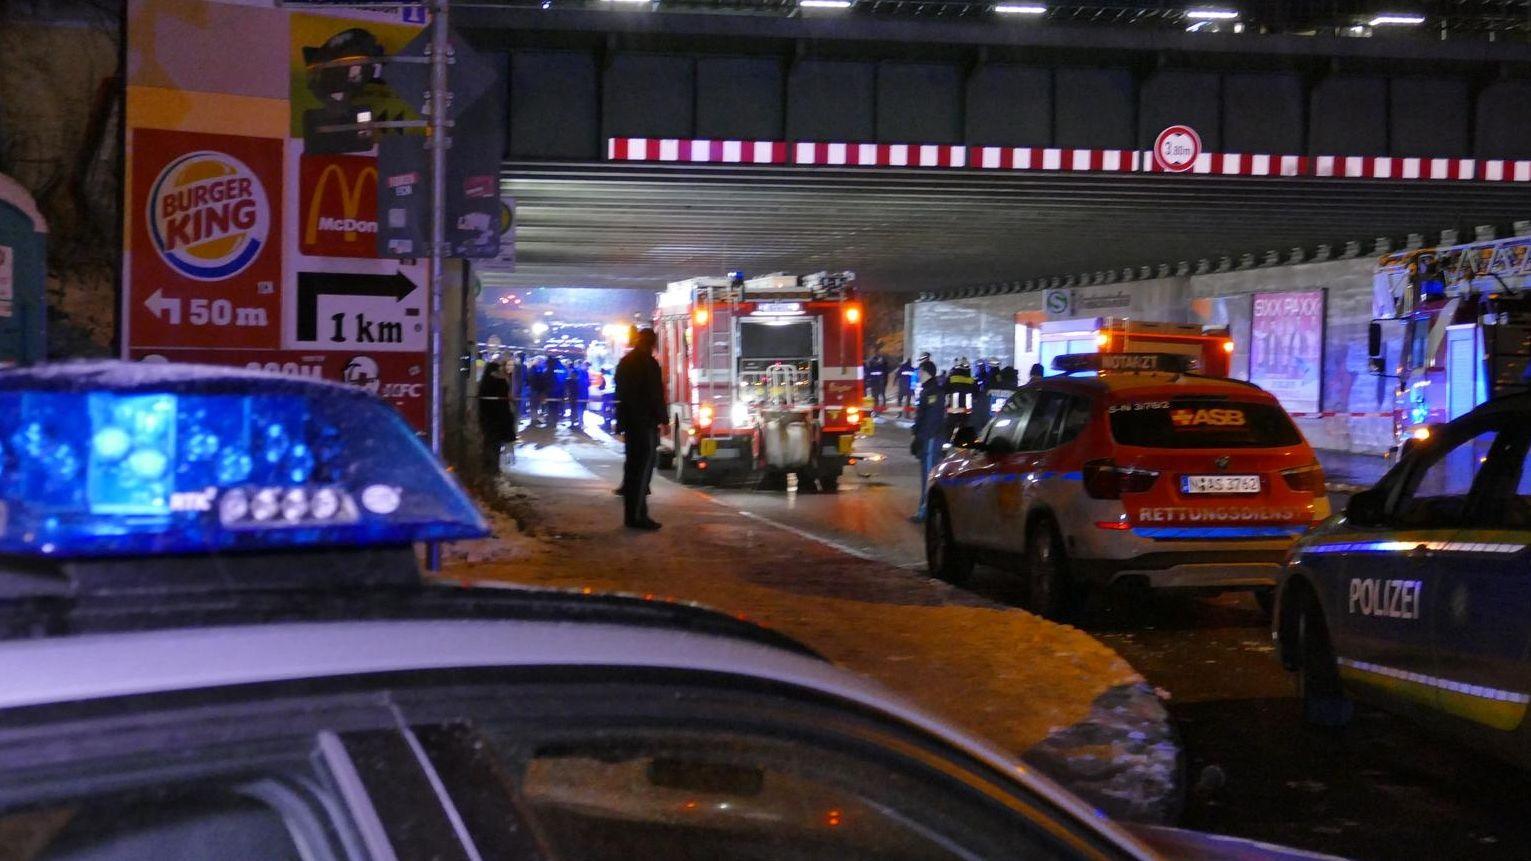 Rettungskräfte am Tatort S-Bahnhof Frankenstadion